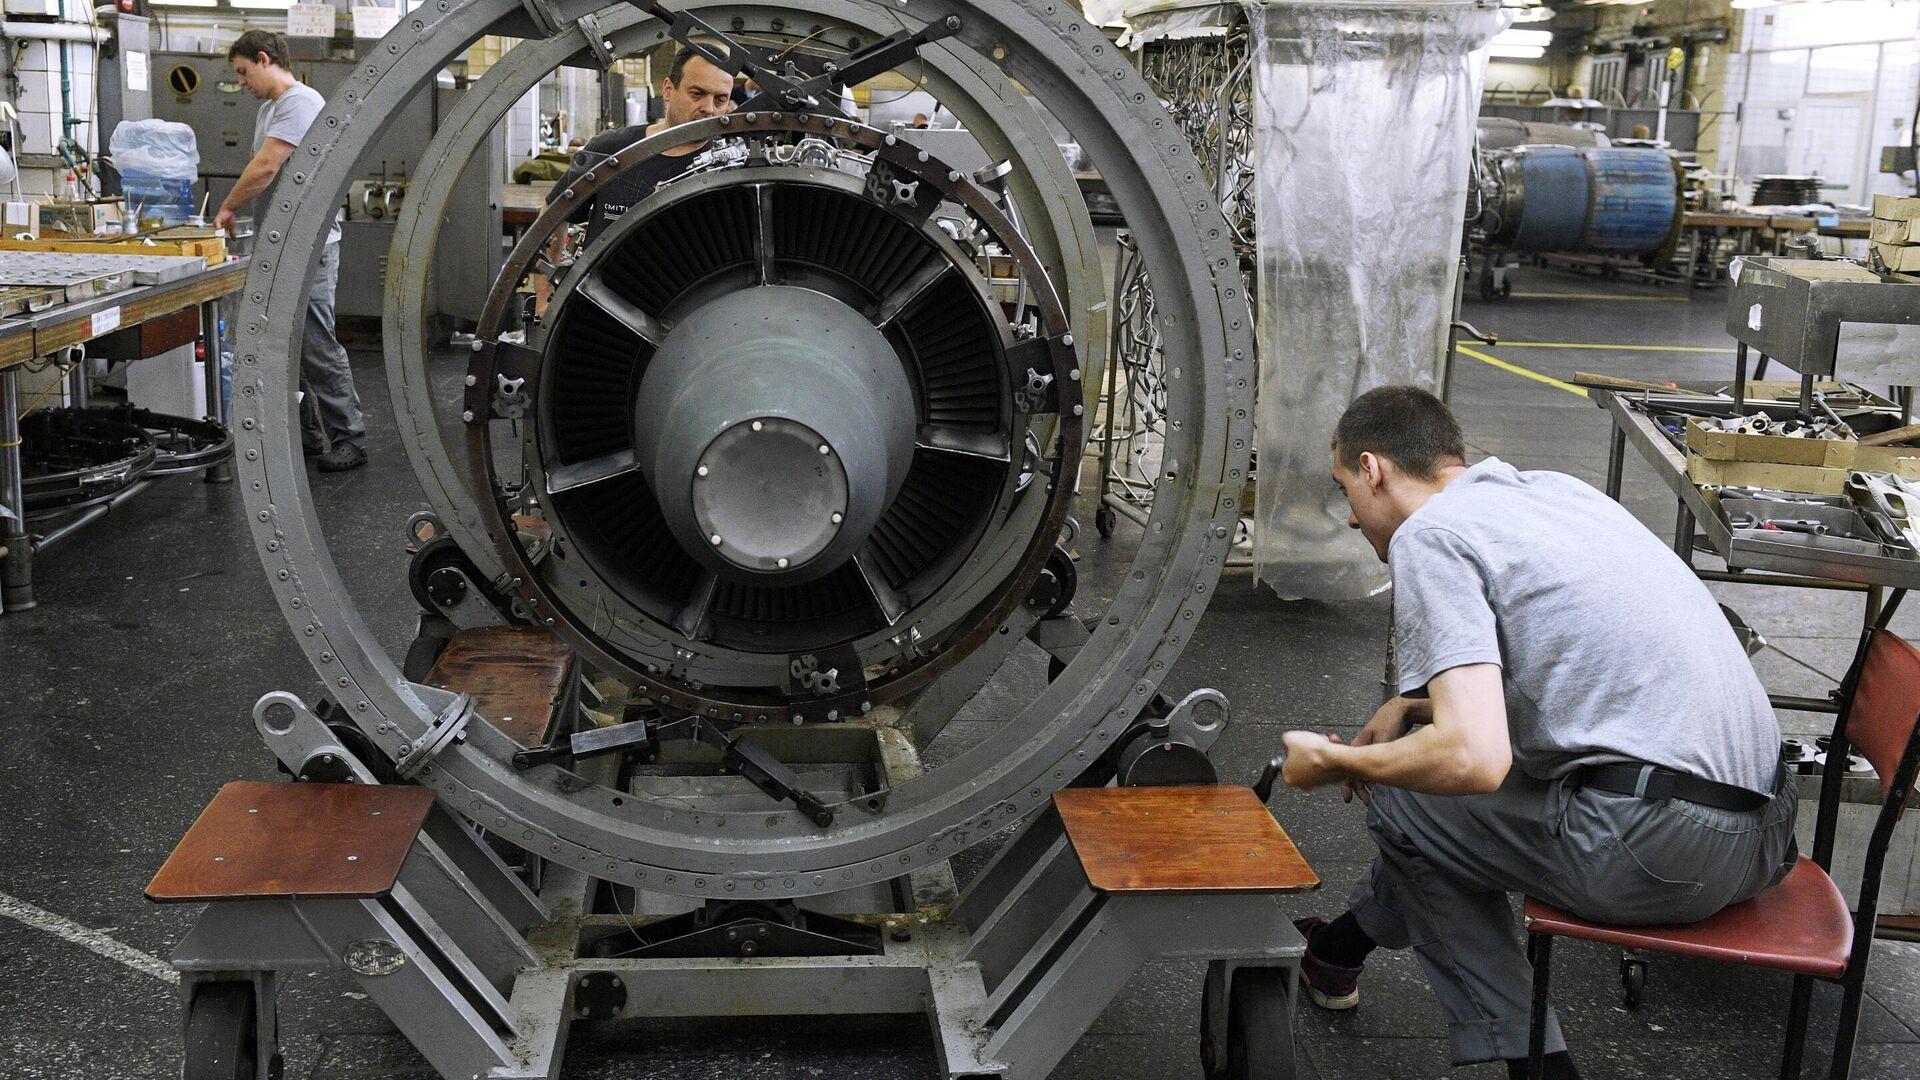 Производство авиадвигателей на ММП имени В. В. Чернышёва - РИА Новости, 1920, 24.07.2021